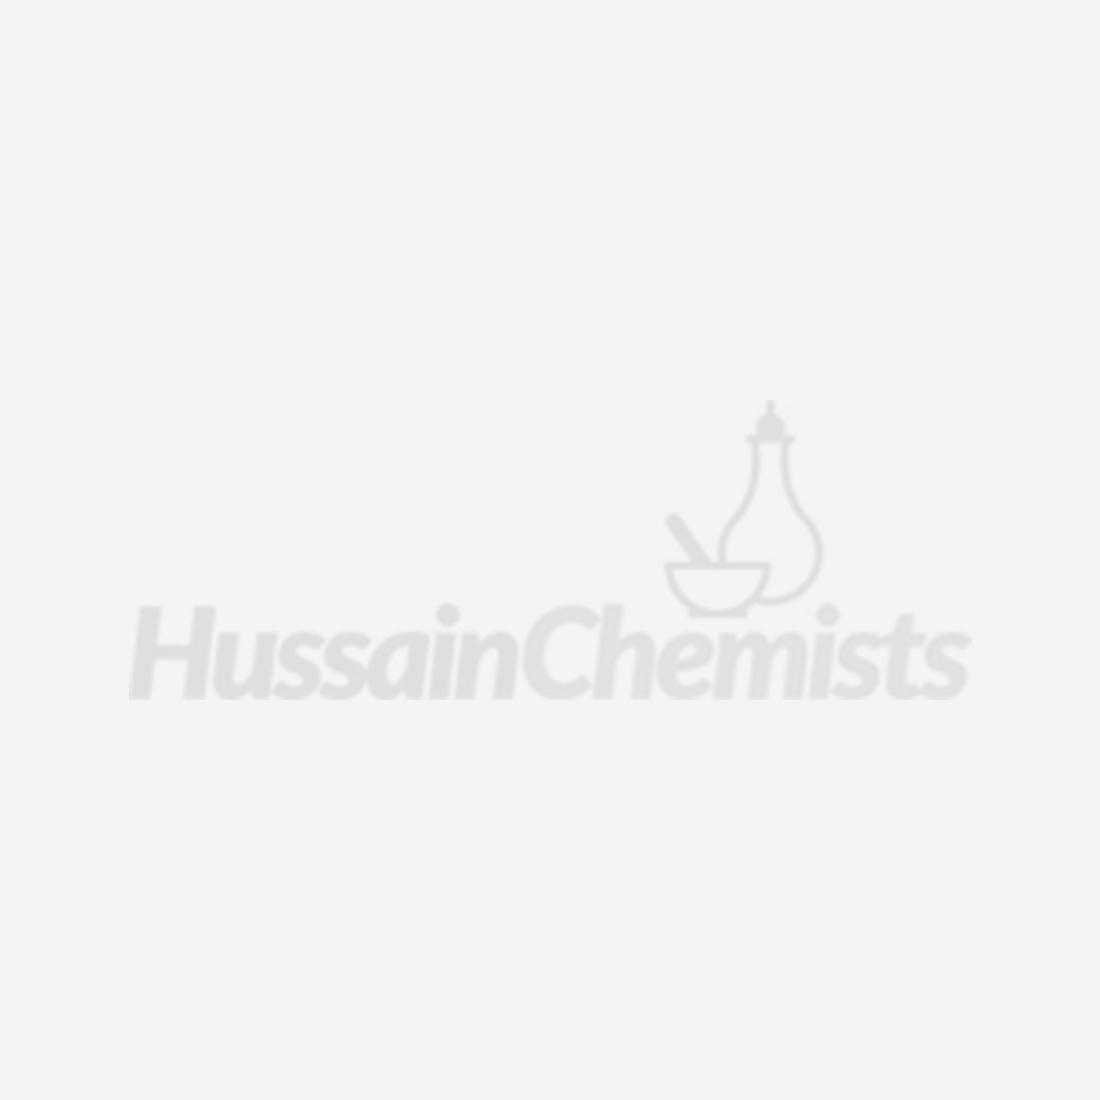 ActiKid® Magic Beans Multi-Vitamin Raspberry Flavour - 90 pack size